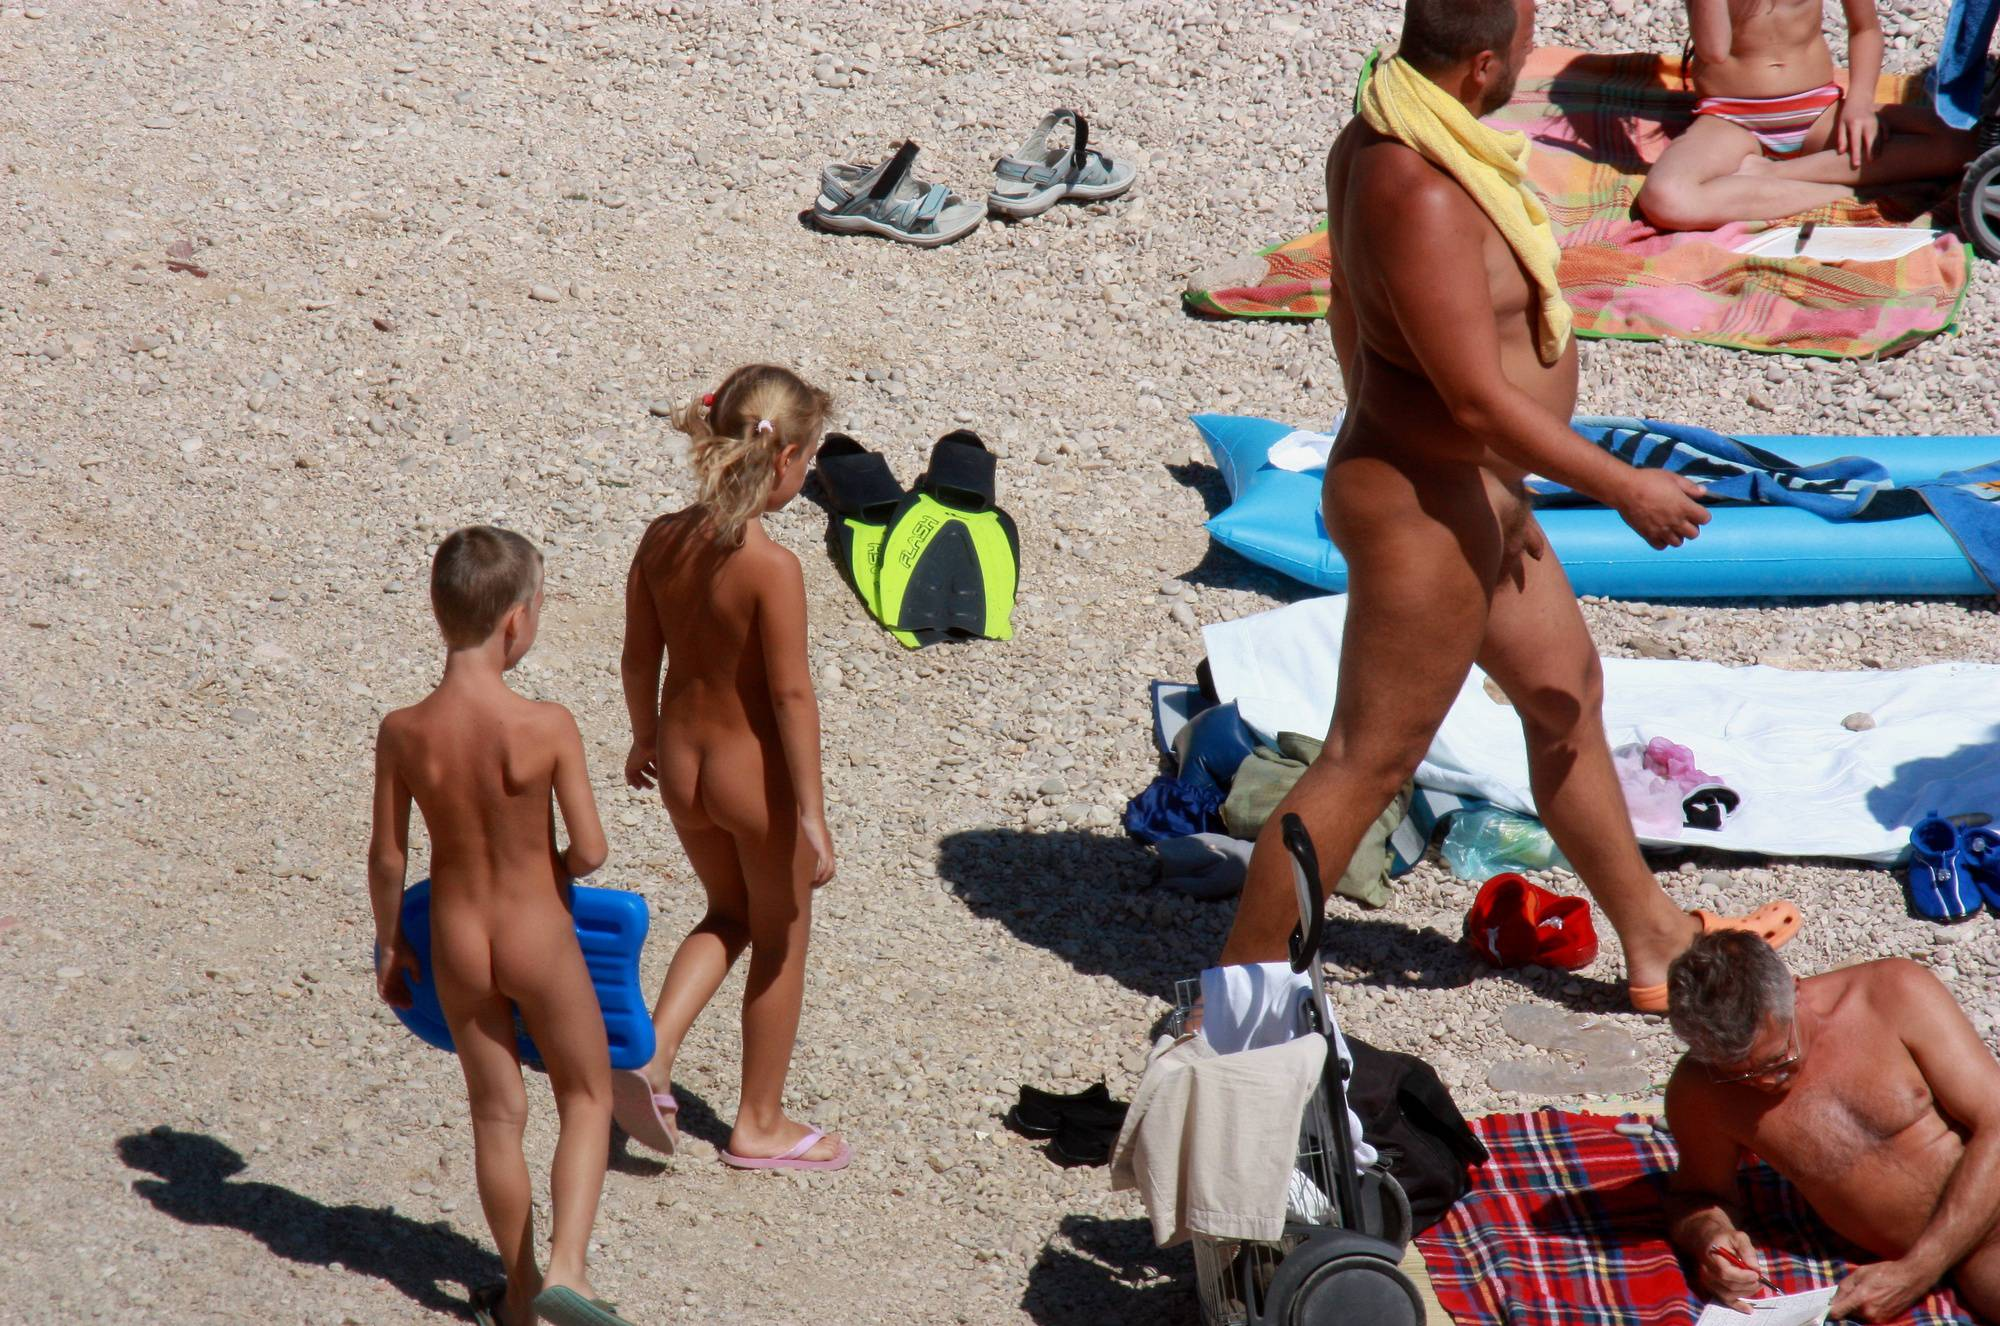 Nudist Pics Follow Nude Beach Family - 1